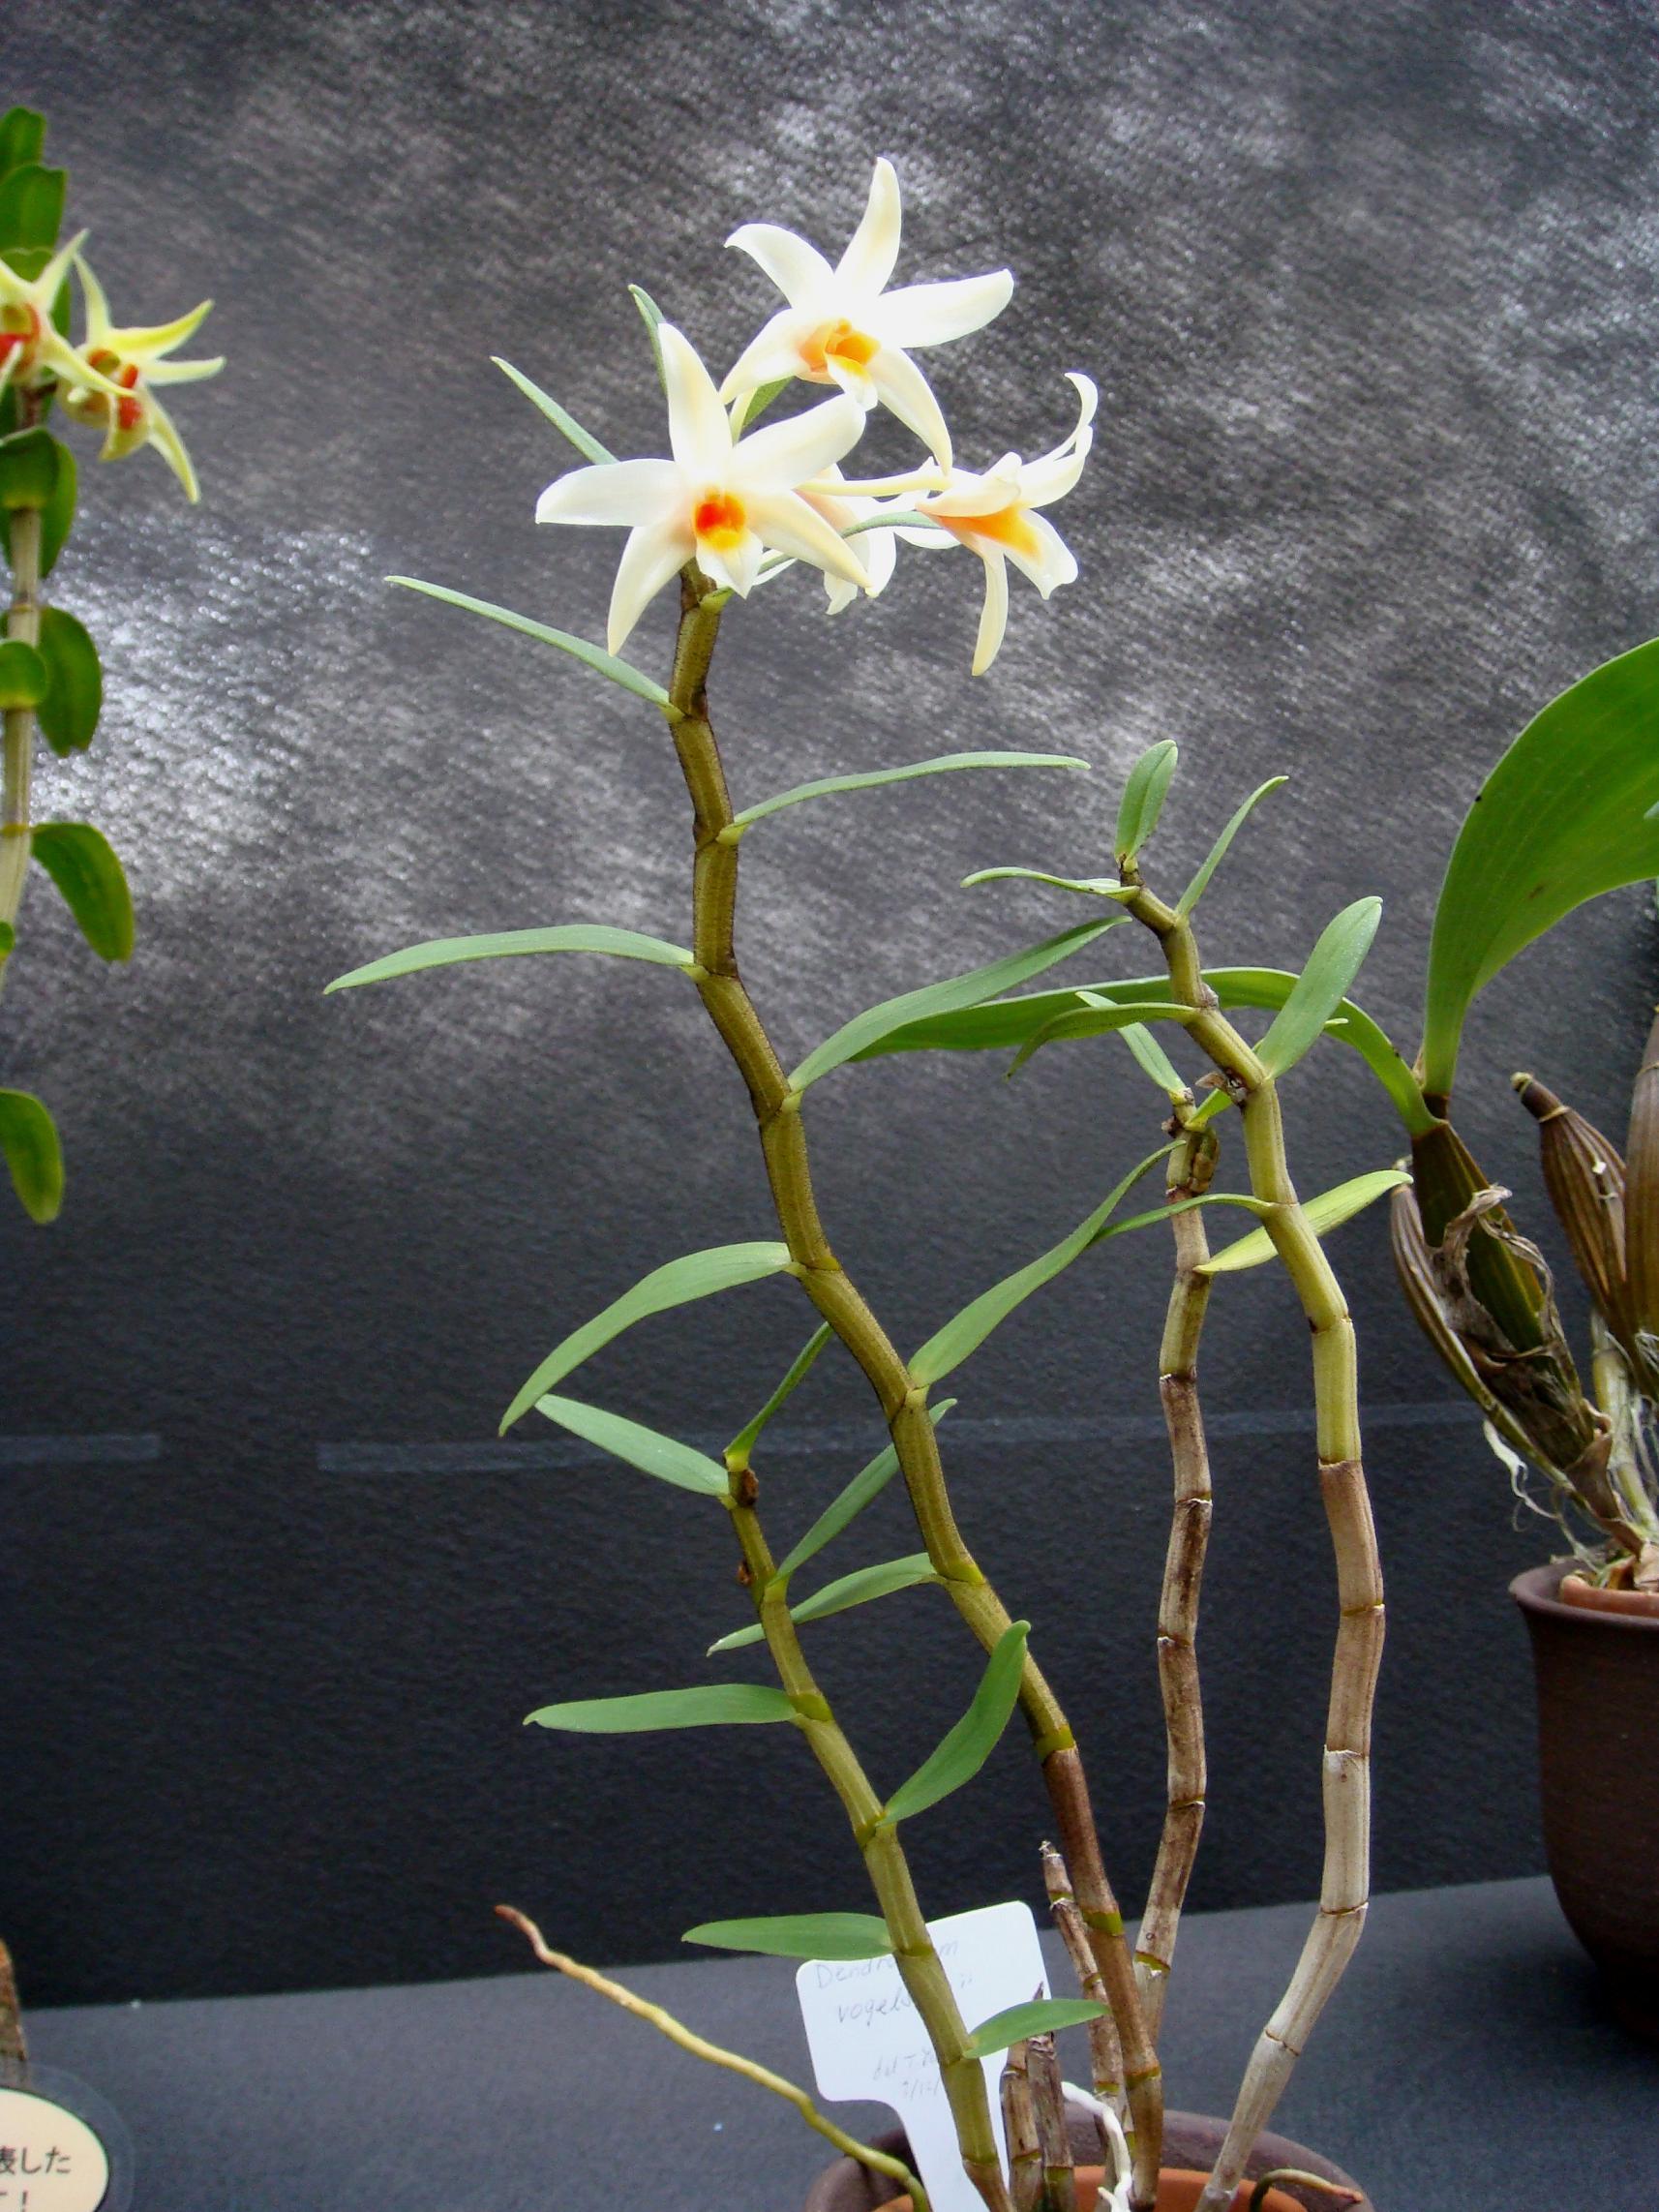 http://orchids.la.coocan.jp/Dendrobium/Dendrobium%20vogelsangii/DSC03194.JPG